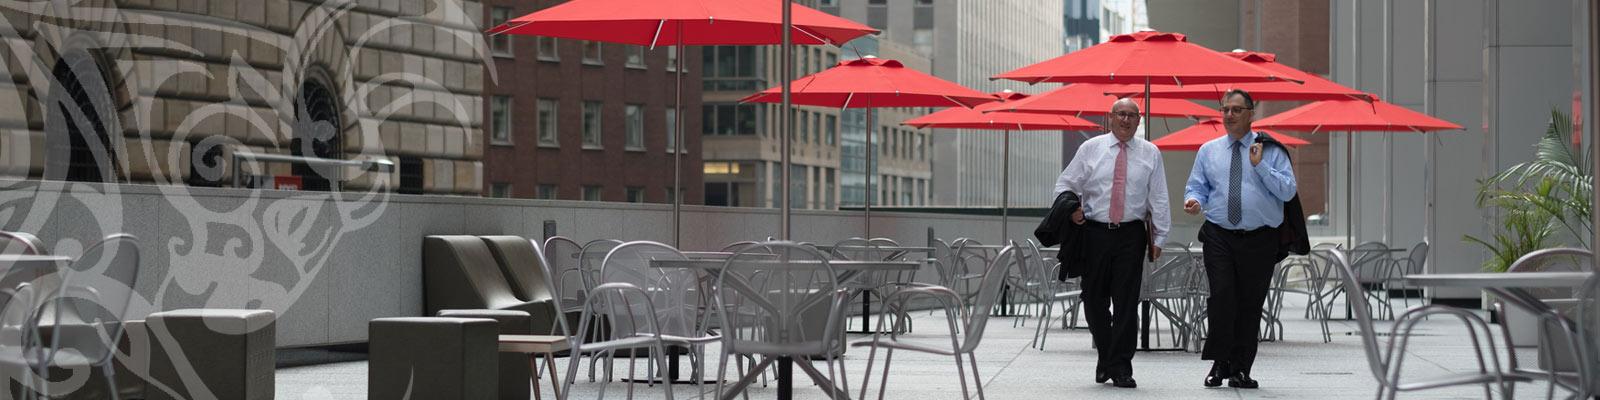 About-the-Firm-Wasser-Russ-NY-Attorneys Walking under umbrellas